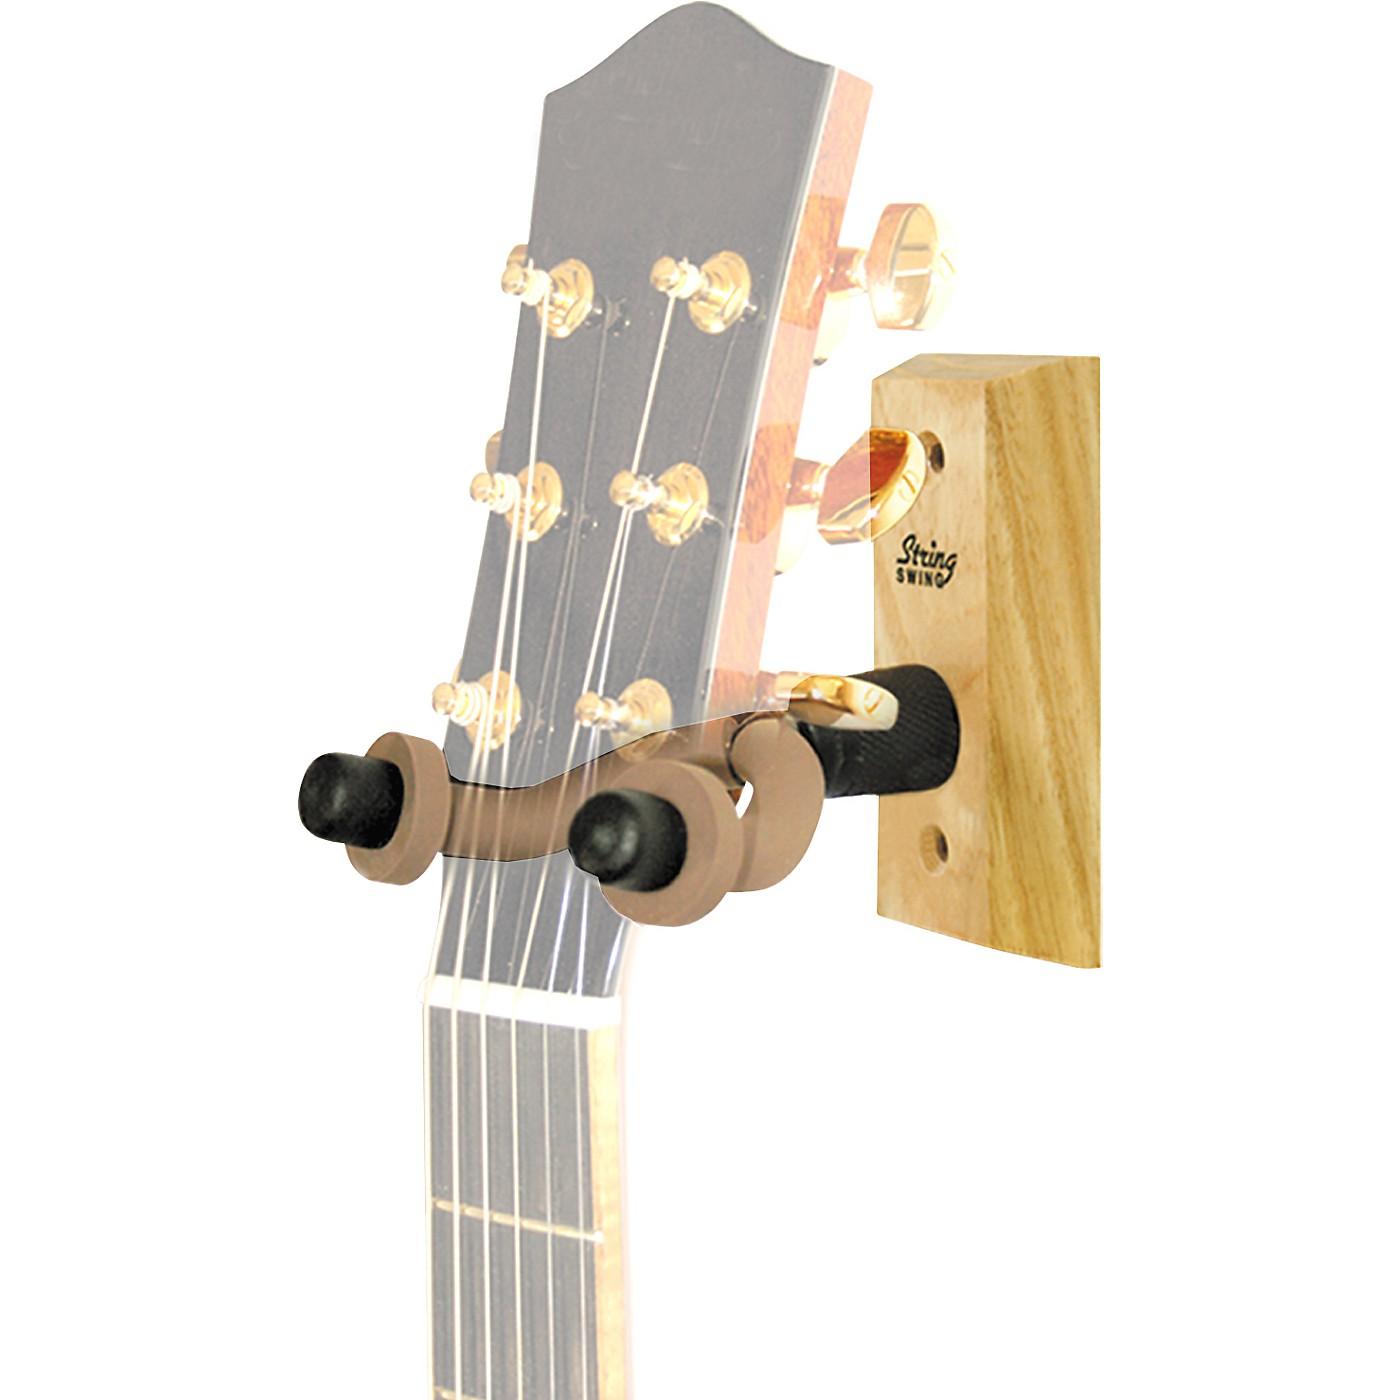 String Swing Wood Guitar Wall Hanger thumbnail